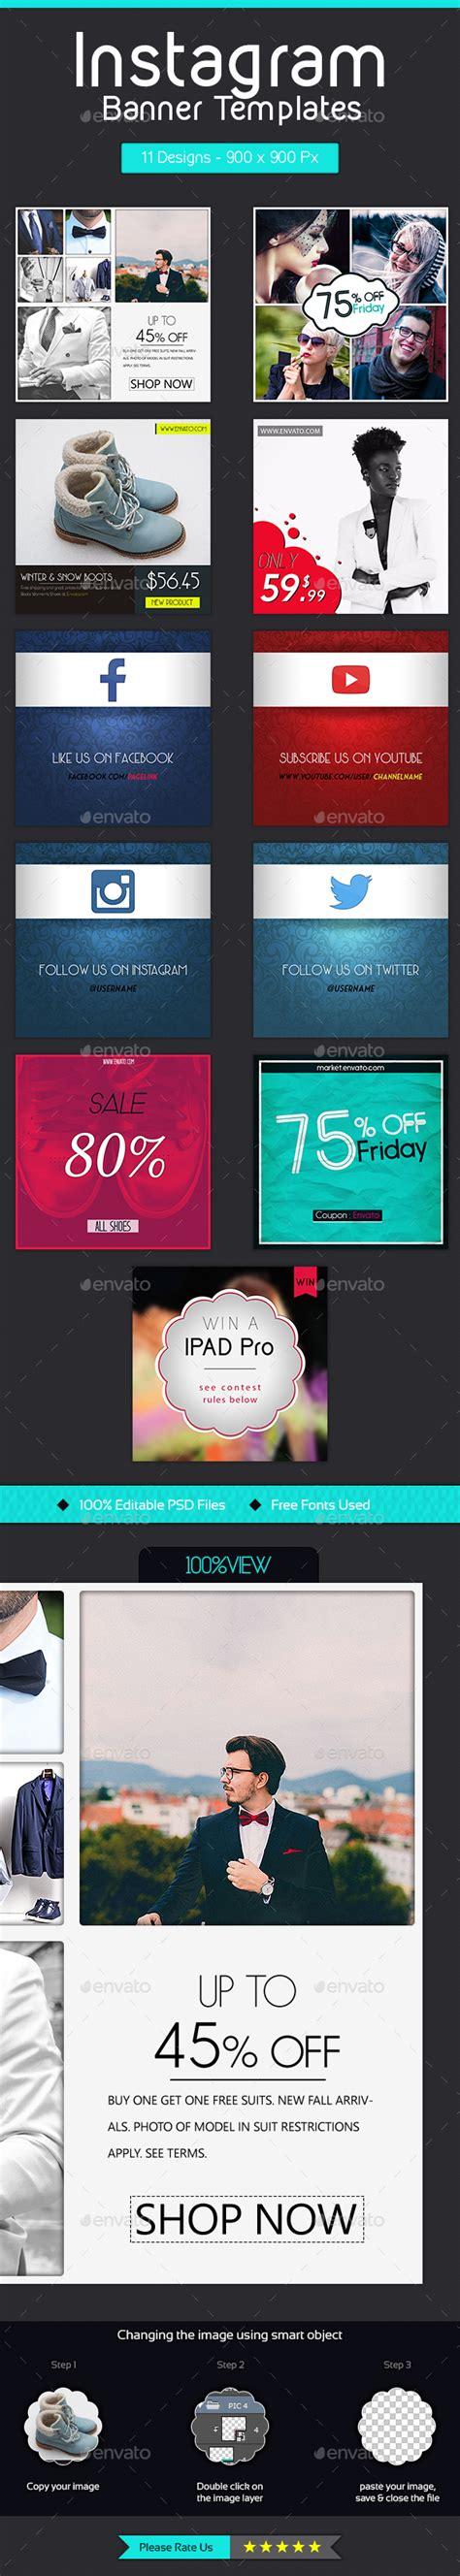 instagram banner templates 11 designs by ahfid instagram banner templates 11 designs by ahfid